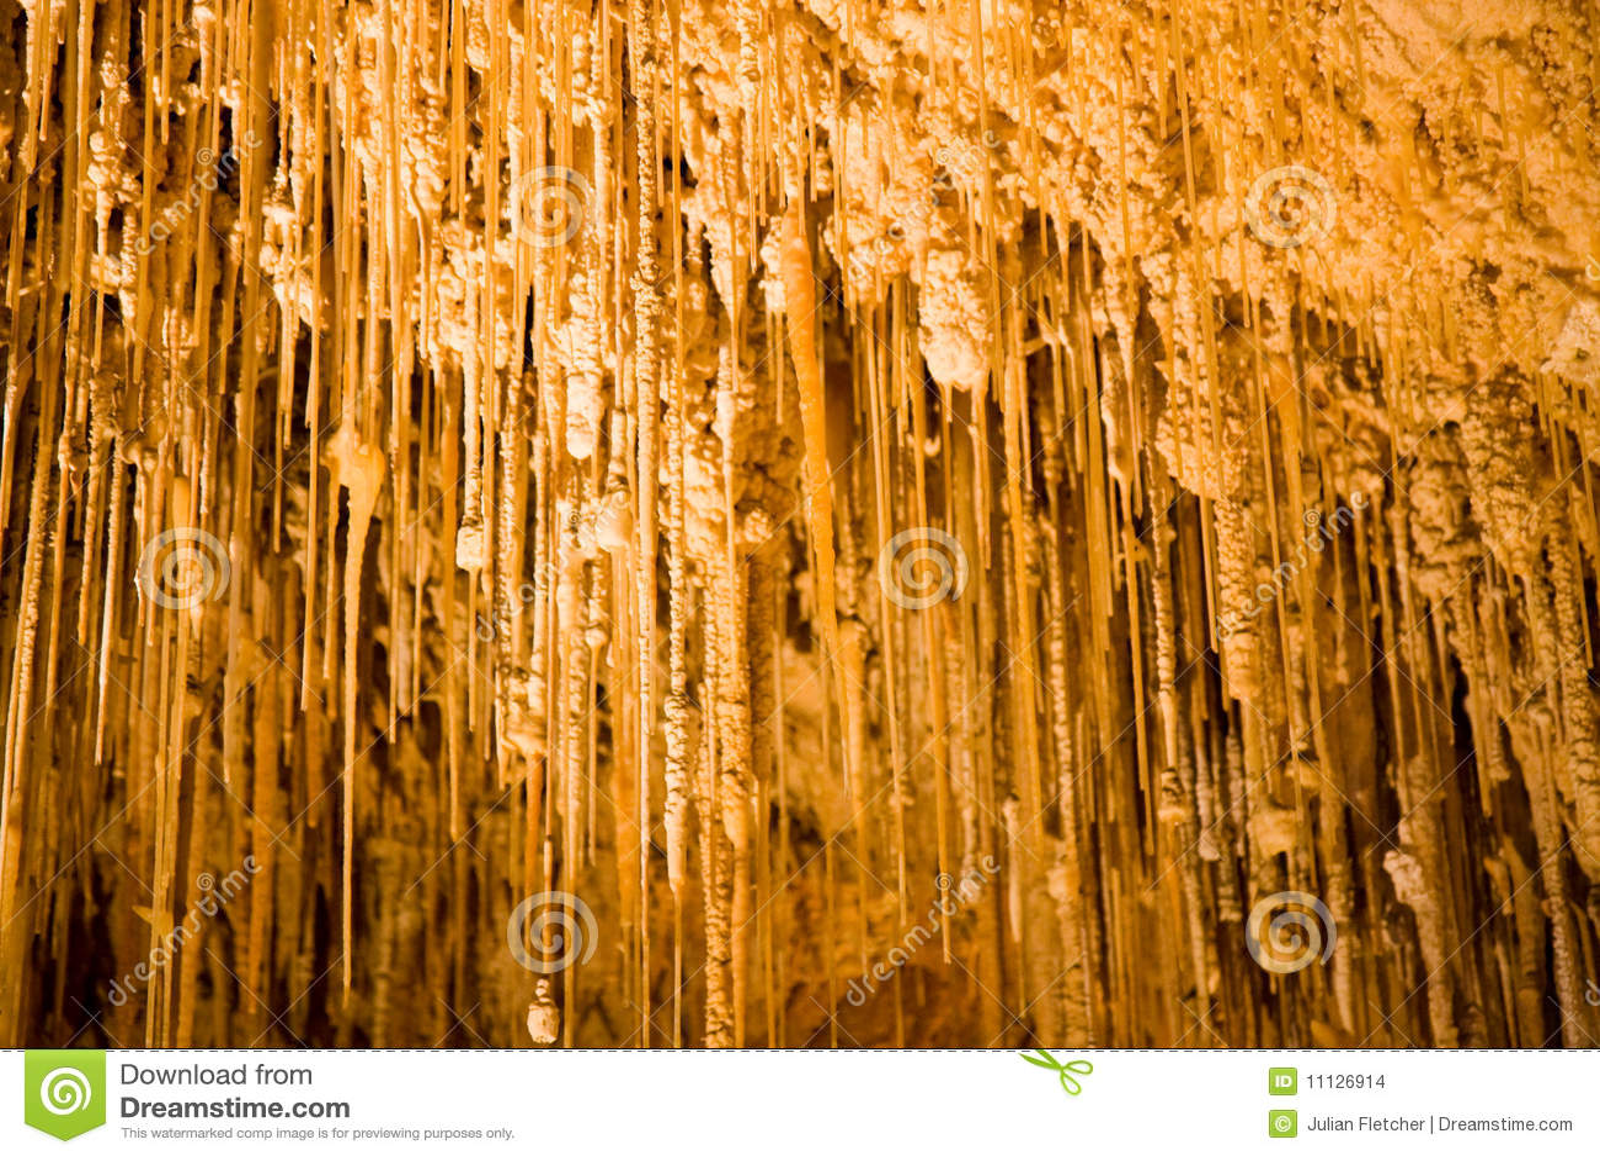 Stalactites and stalagmites in Bermuda